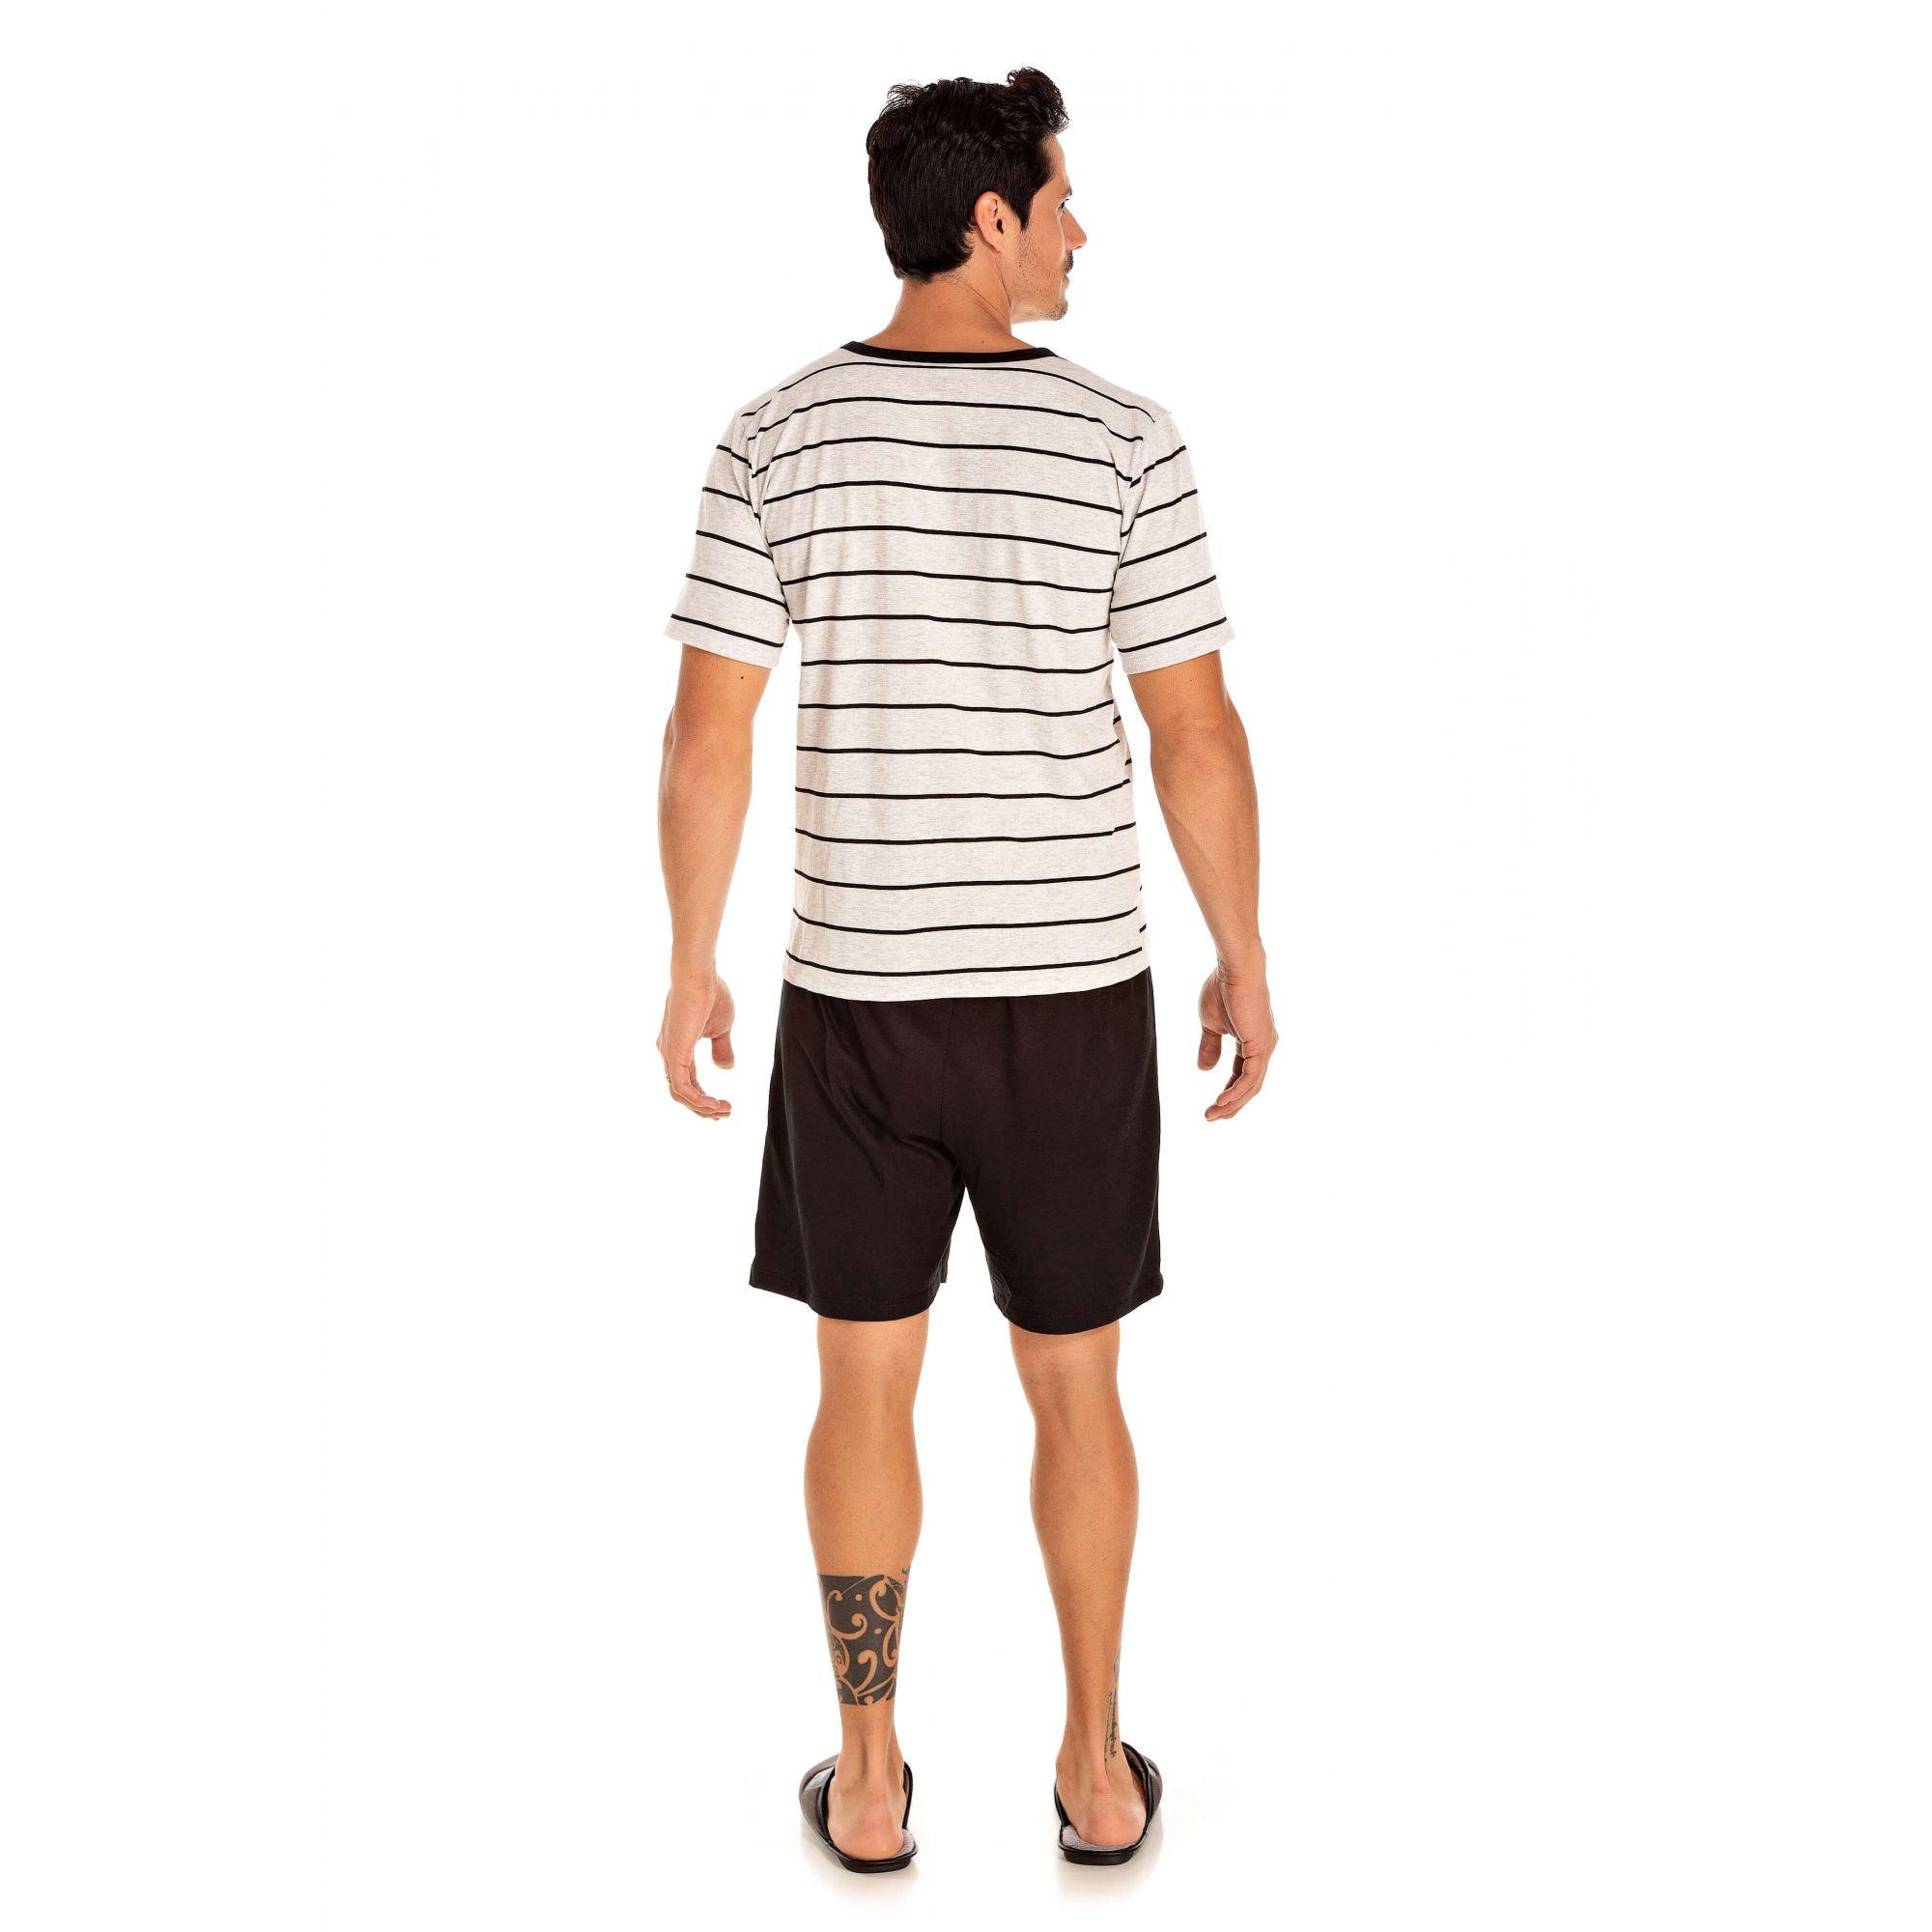 100/D - Pijama Adulto Masculino Listrado - Pérola